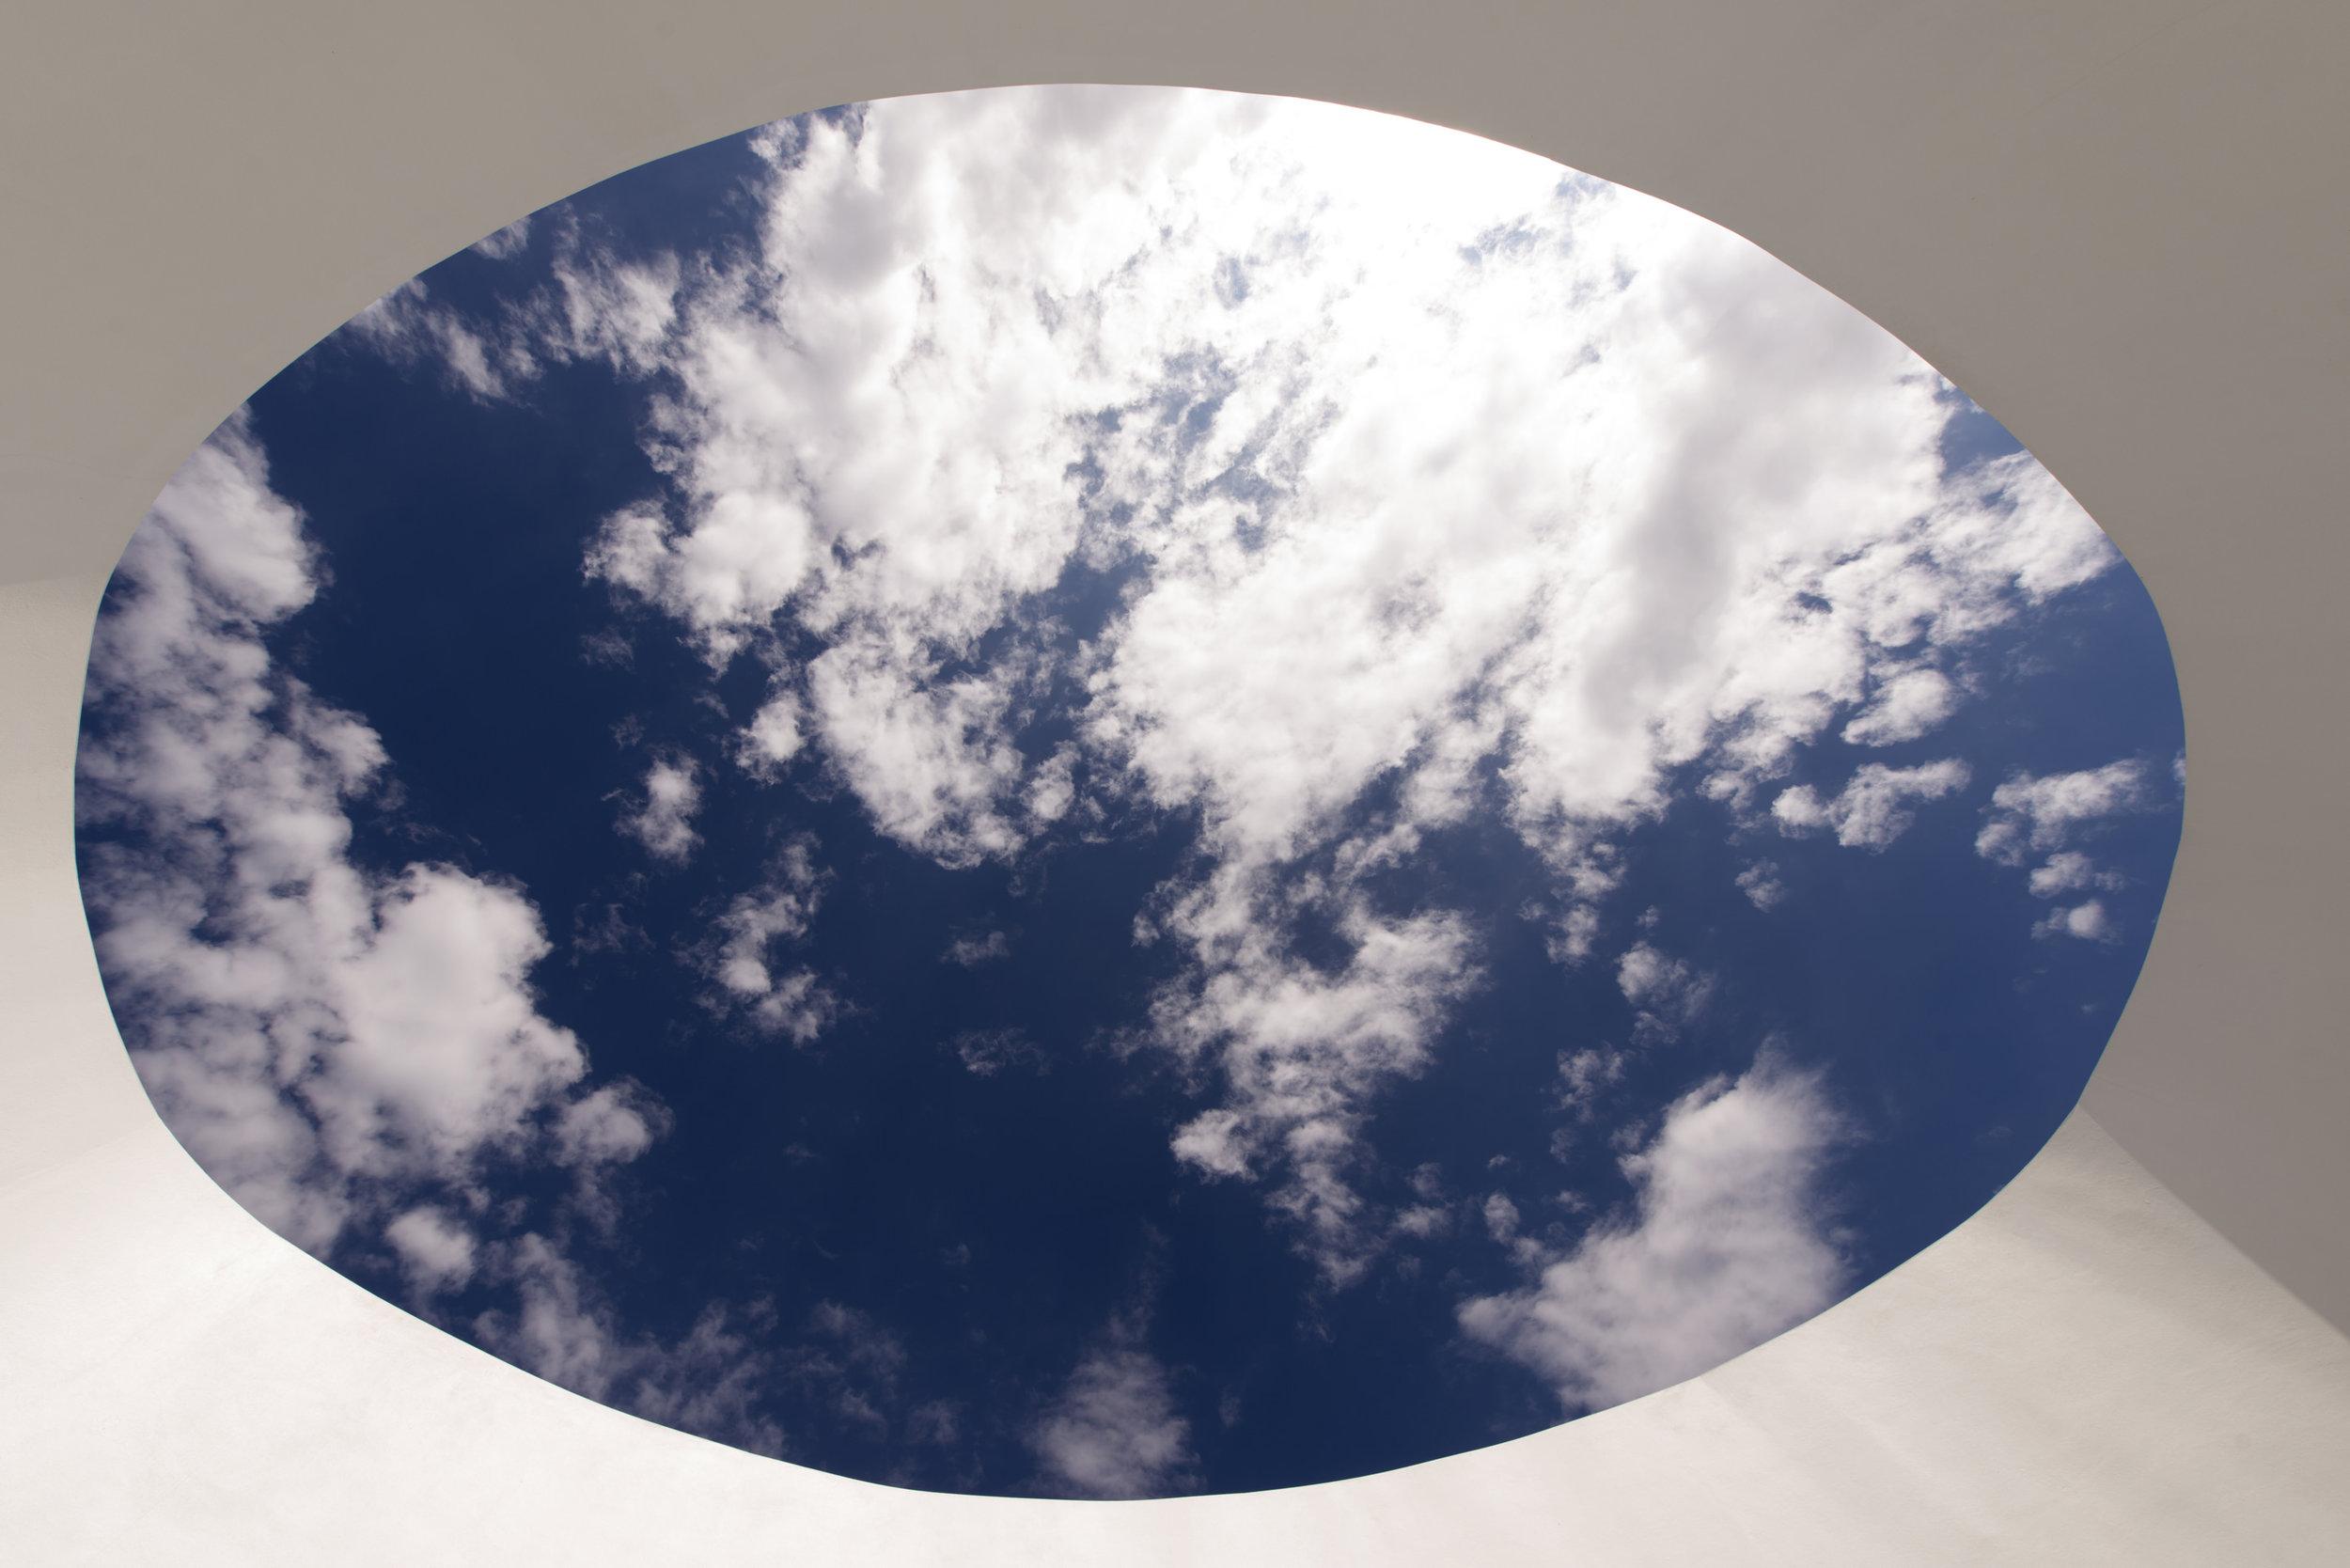 la esperanza therapeutic pools san juan open roof detail fuster architects.jpg